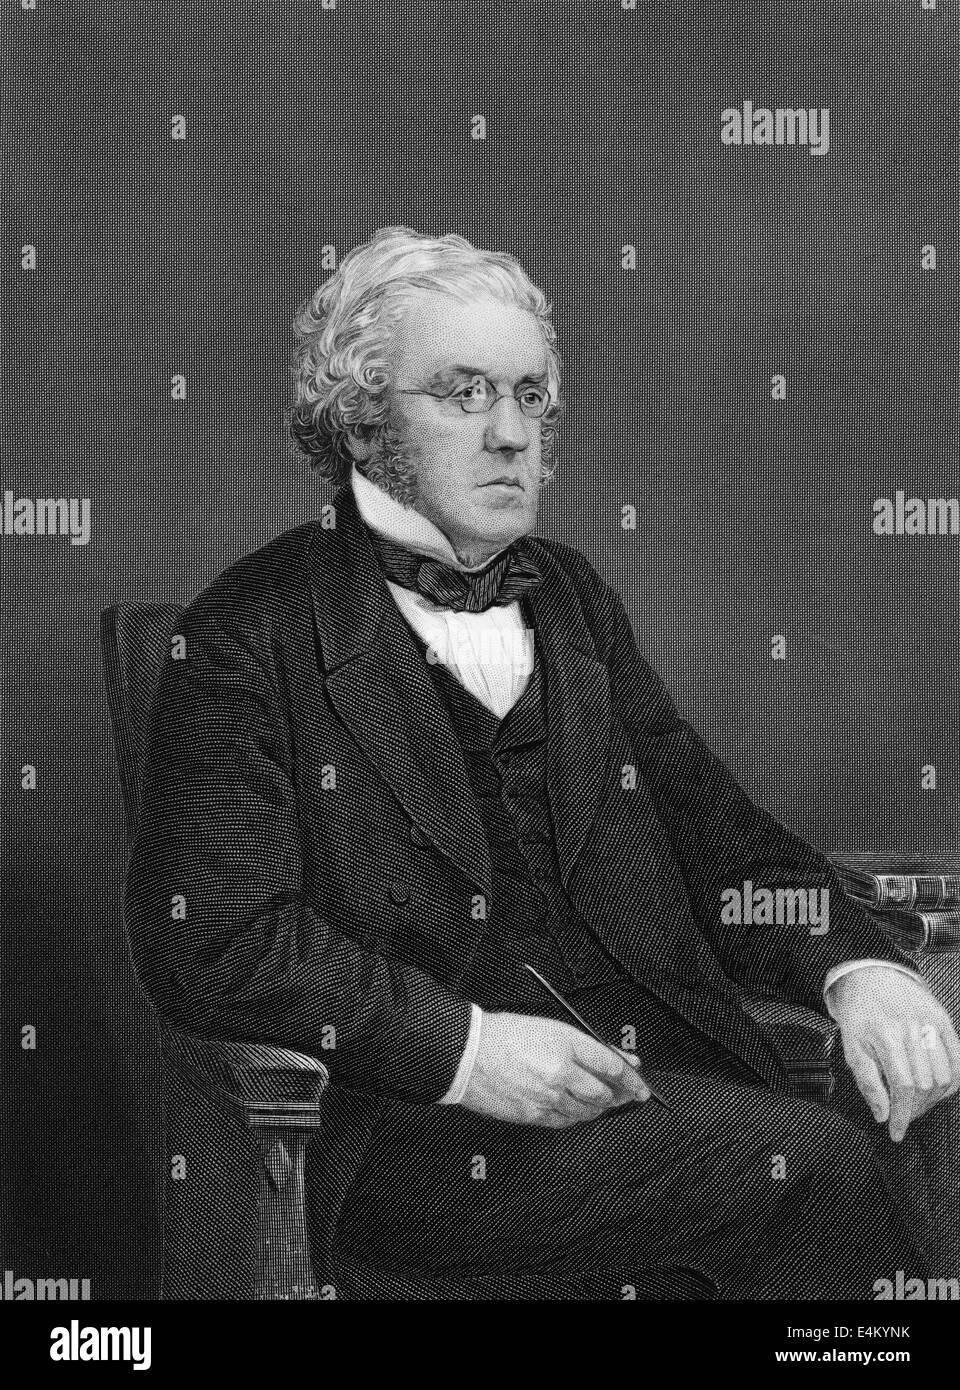 William Makepeace Thackeray, 1811 - 1863, an English writer - Stock Image